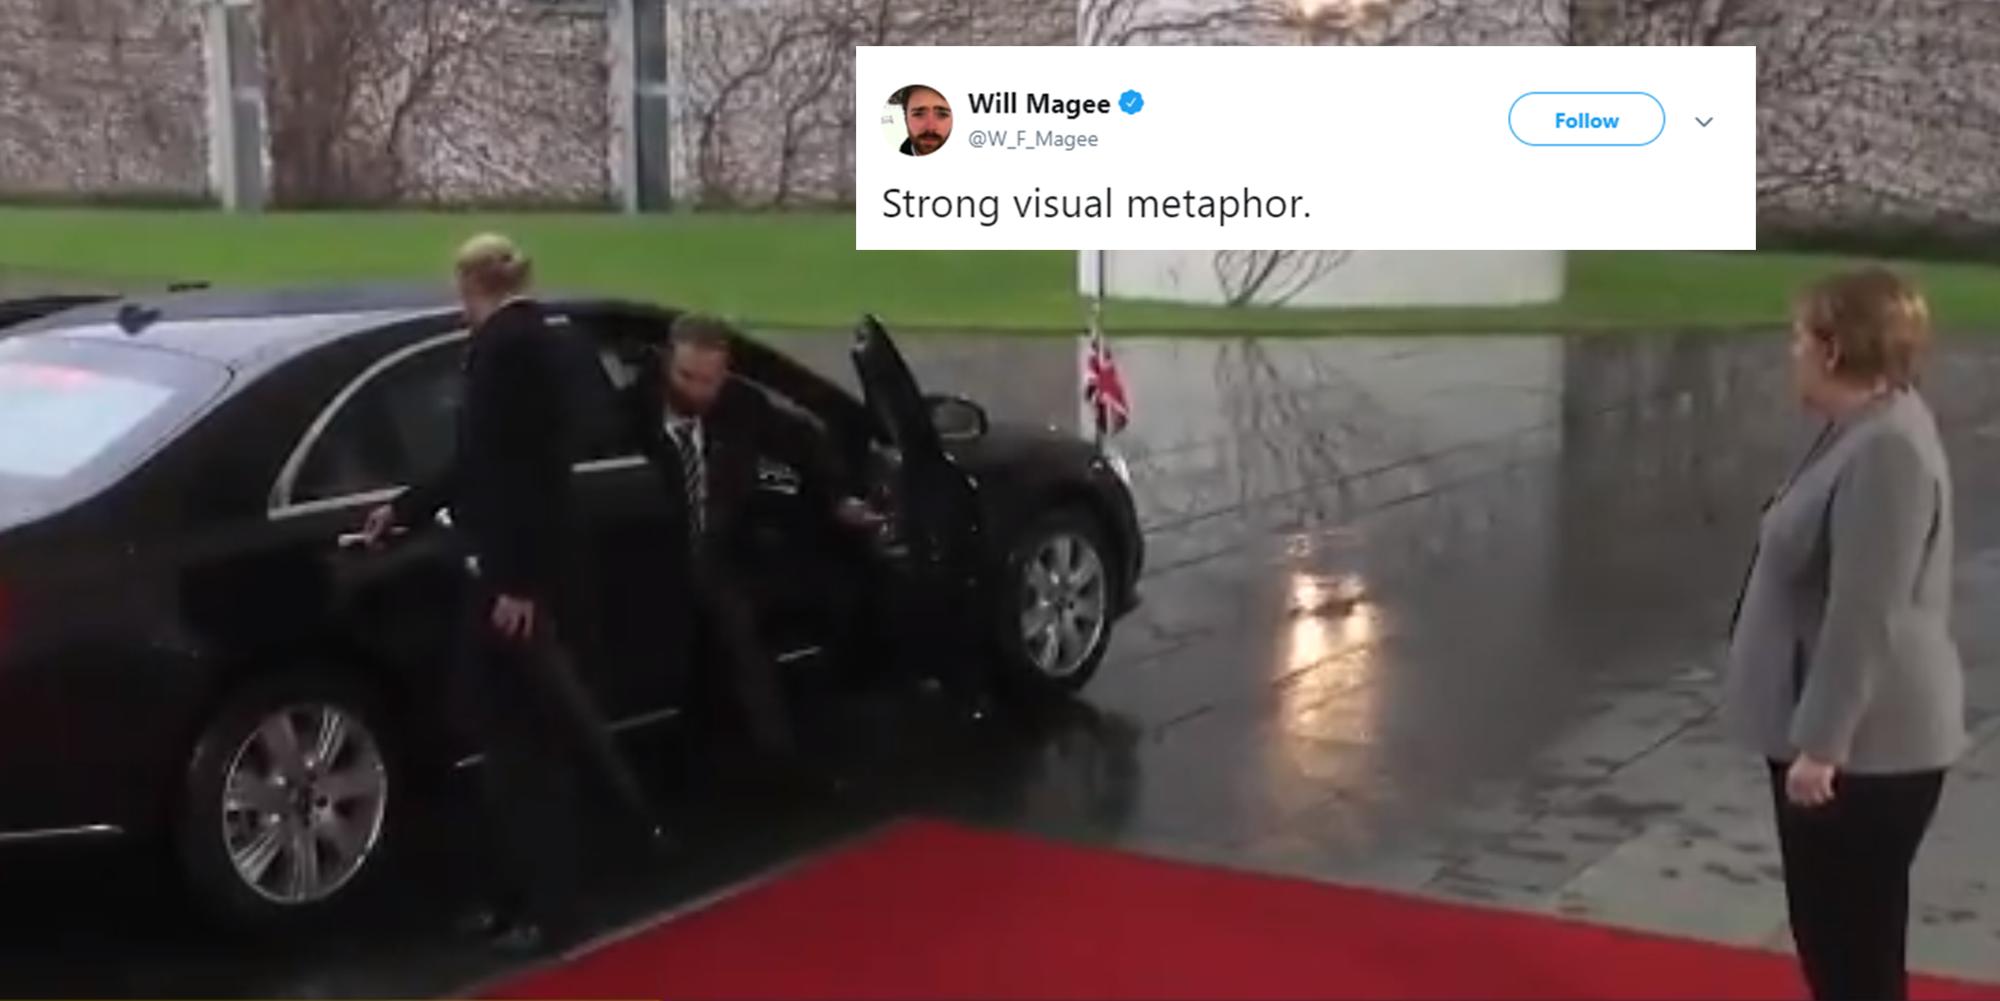 Theresa May got locked in her car before meeting Angela Merkel and the jokes wrote themselves